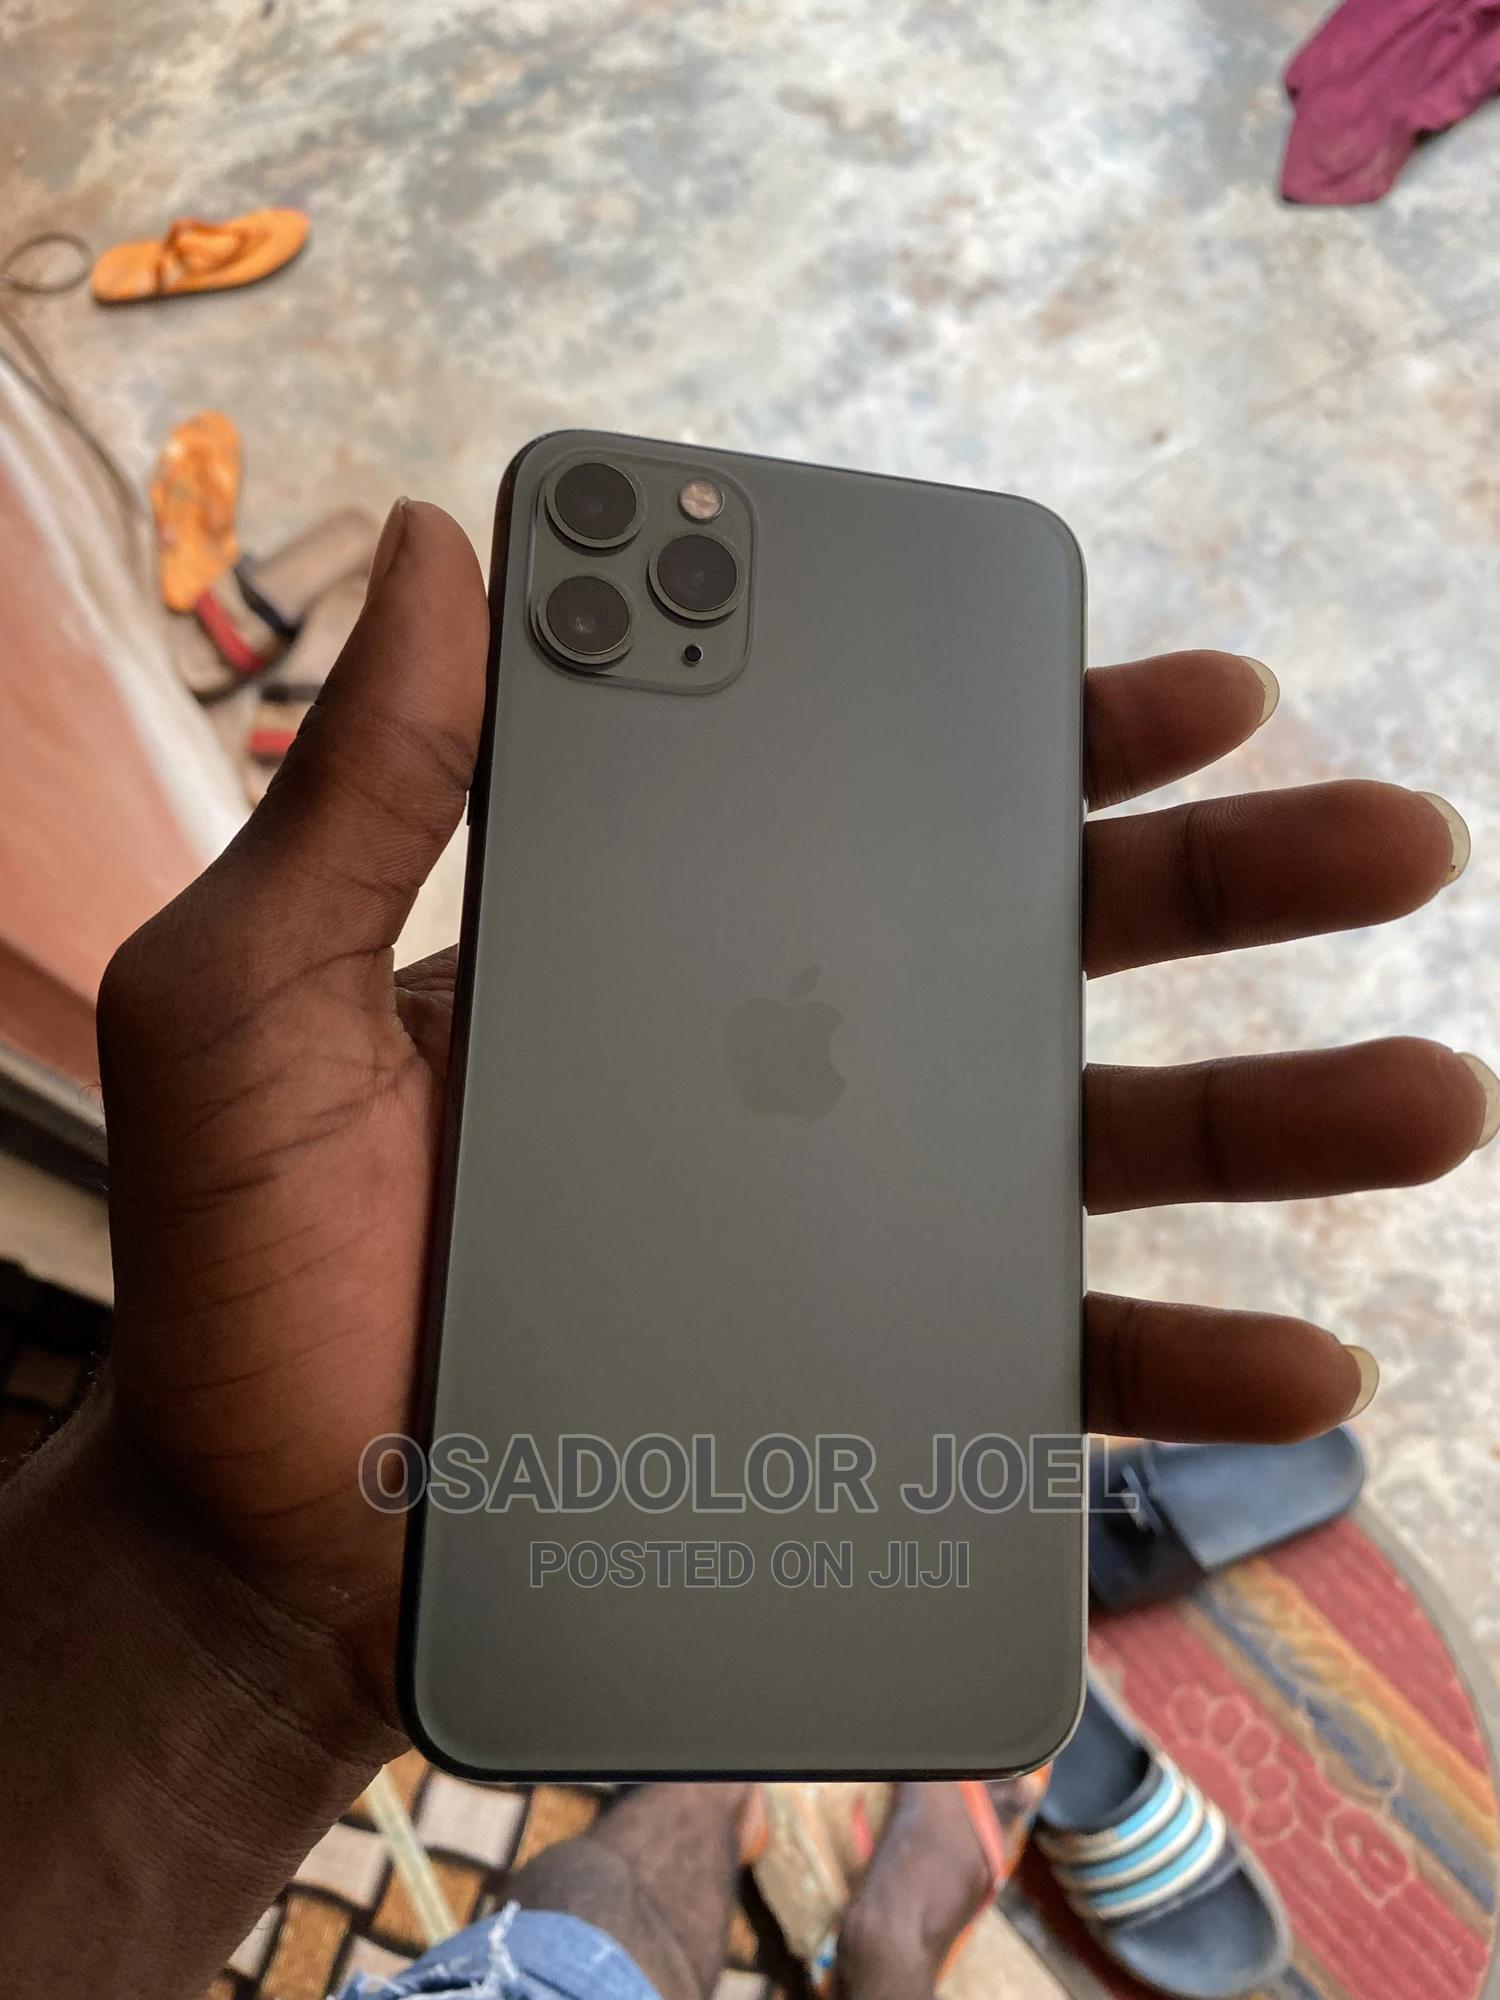 Apple iPhone 11 Pro Max 64 GB Black | Mobile Phones for sale in Benin City, Edo State, Nigeria